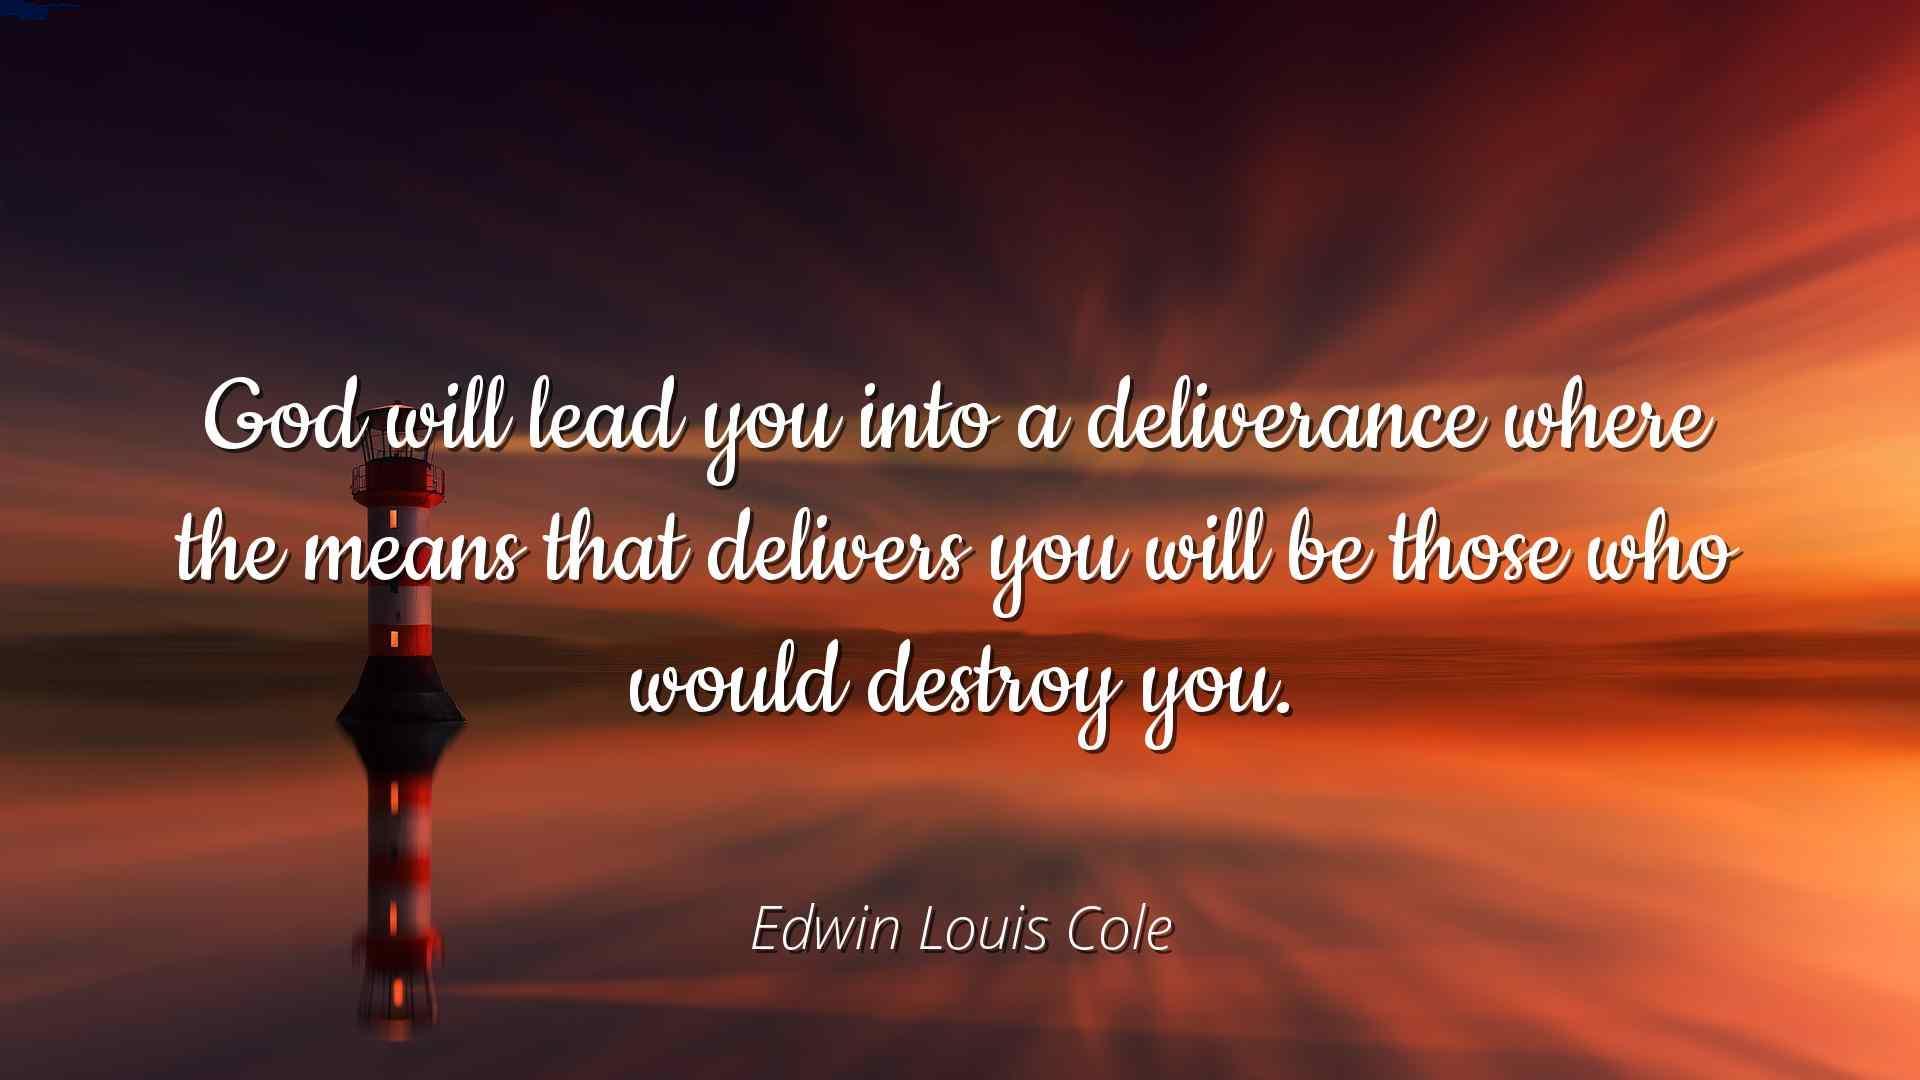 Edwin Louis Cole   God will lead you into a deliverance where the